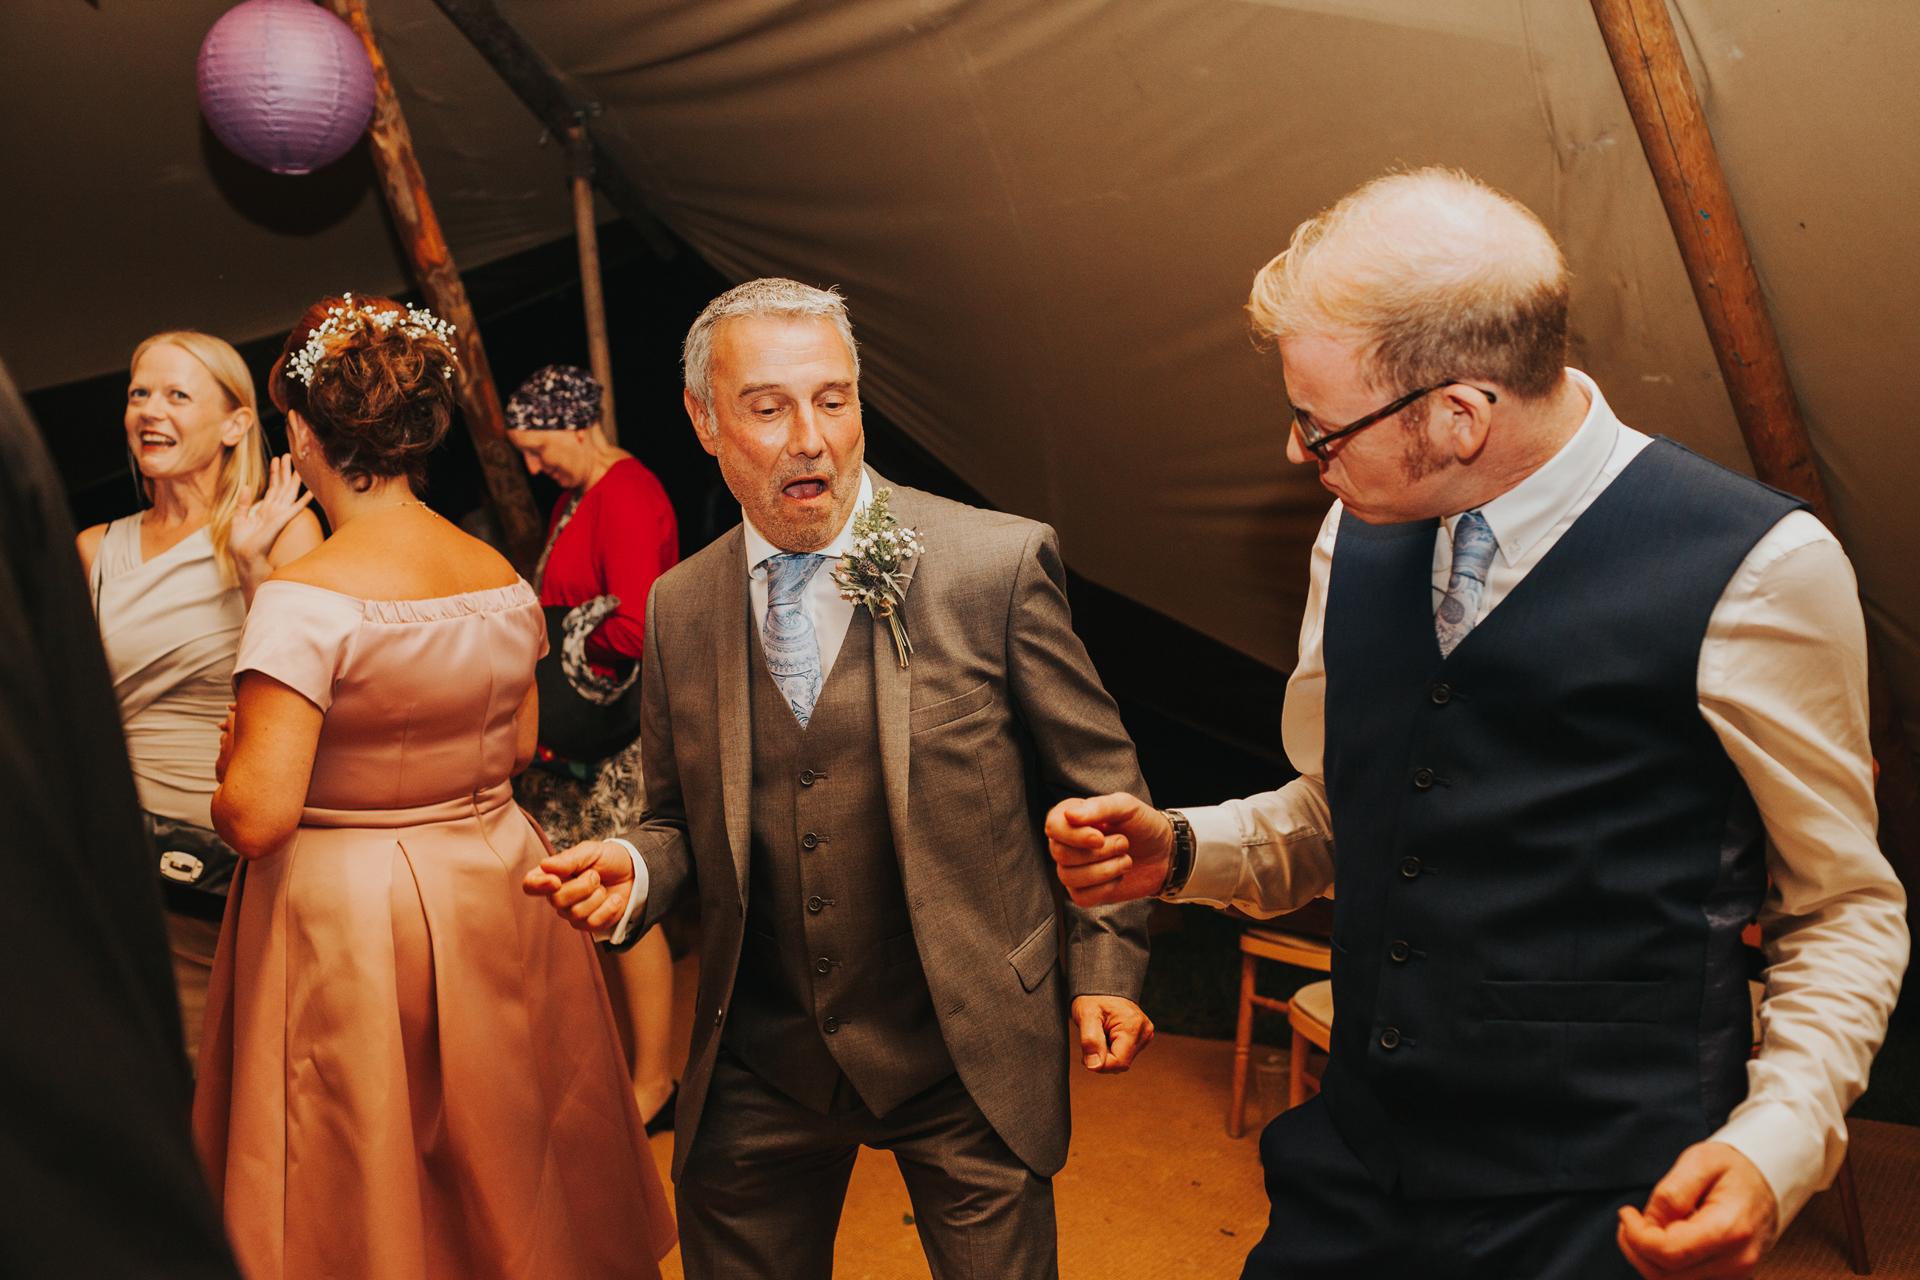 Groom and friend dancing.